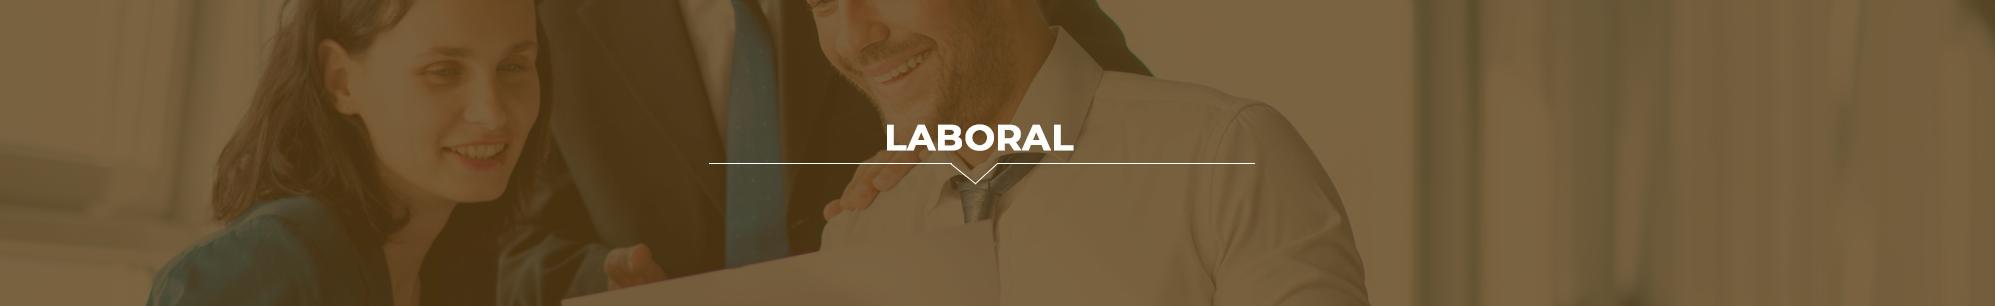 labroal2